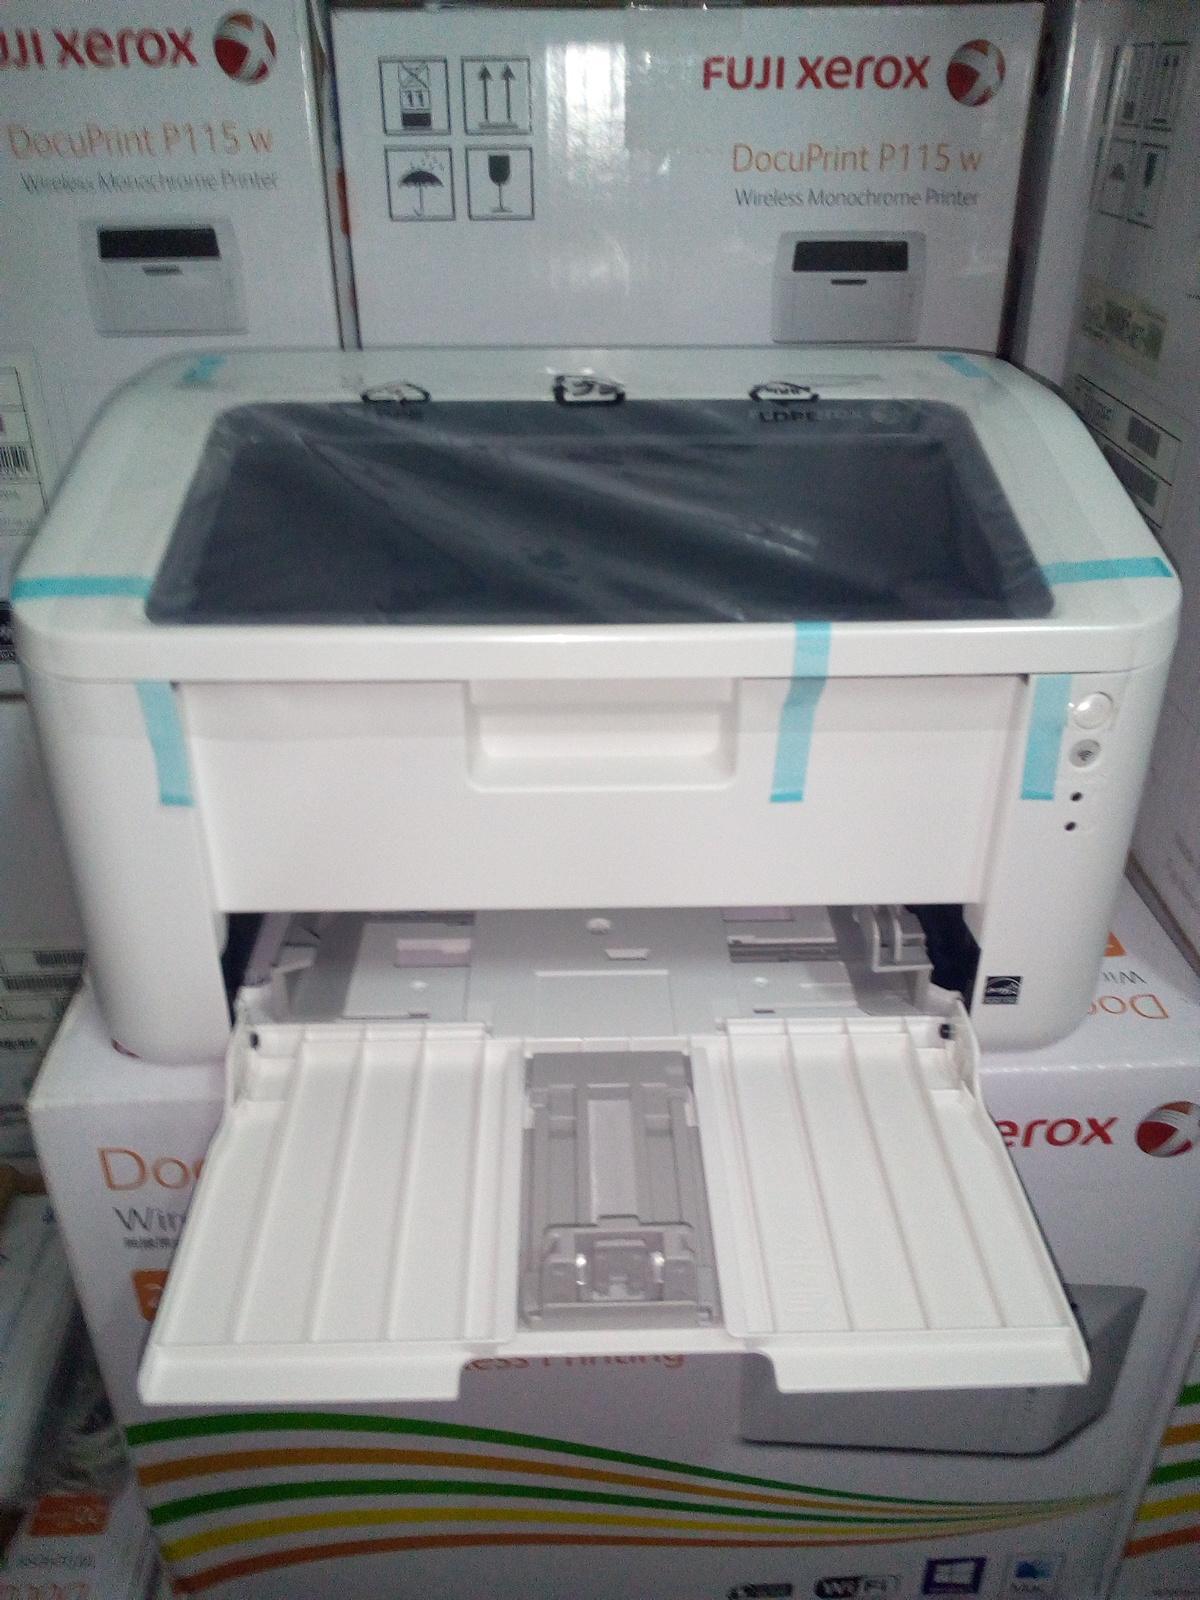 Fuji Xerox Docuprint P115w wireless monochrome Laser Printer